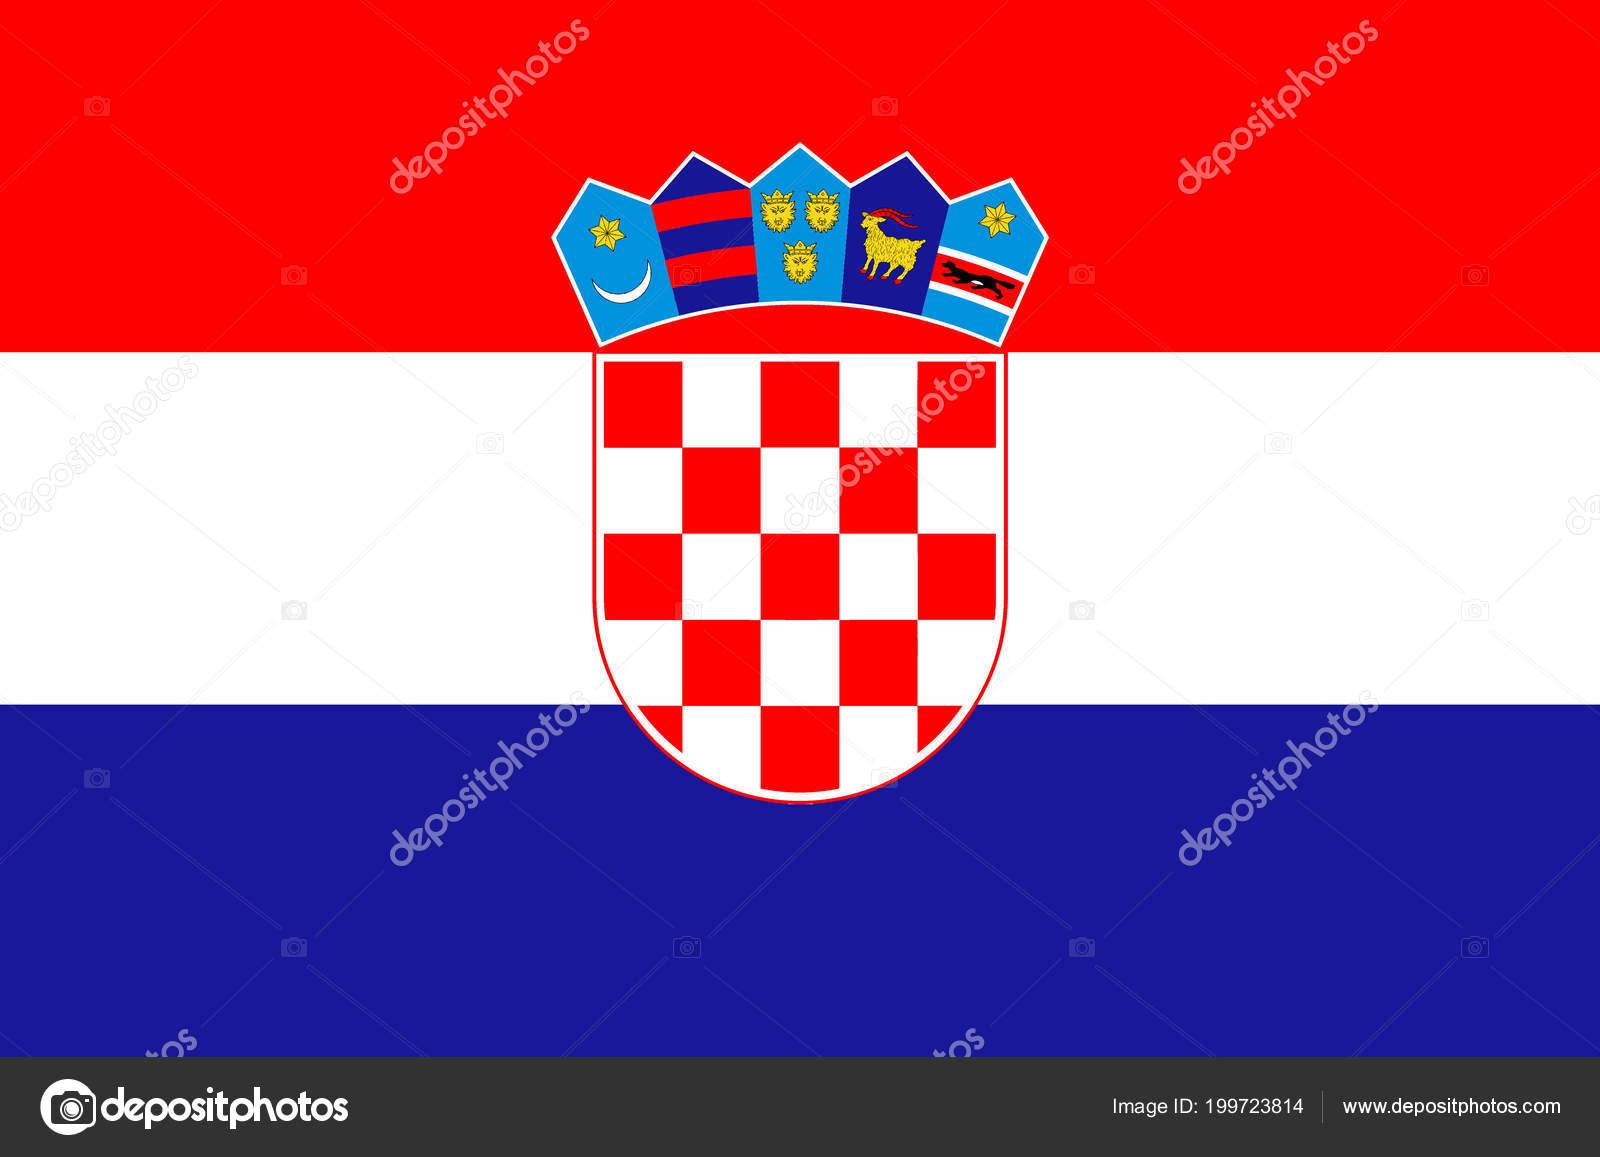 Bandera Nacional Croata Bandera Oficial Colores Exacta Croacia Color  Verdadero — Vector de stock 0338f635d34ce